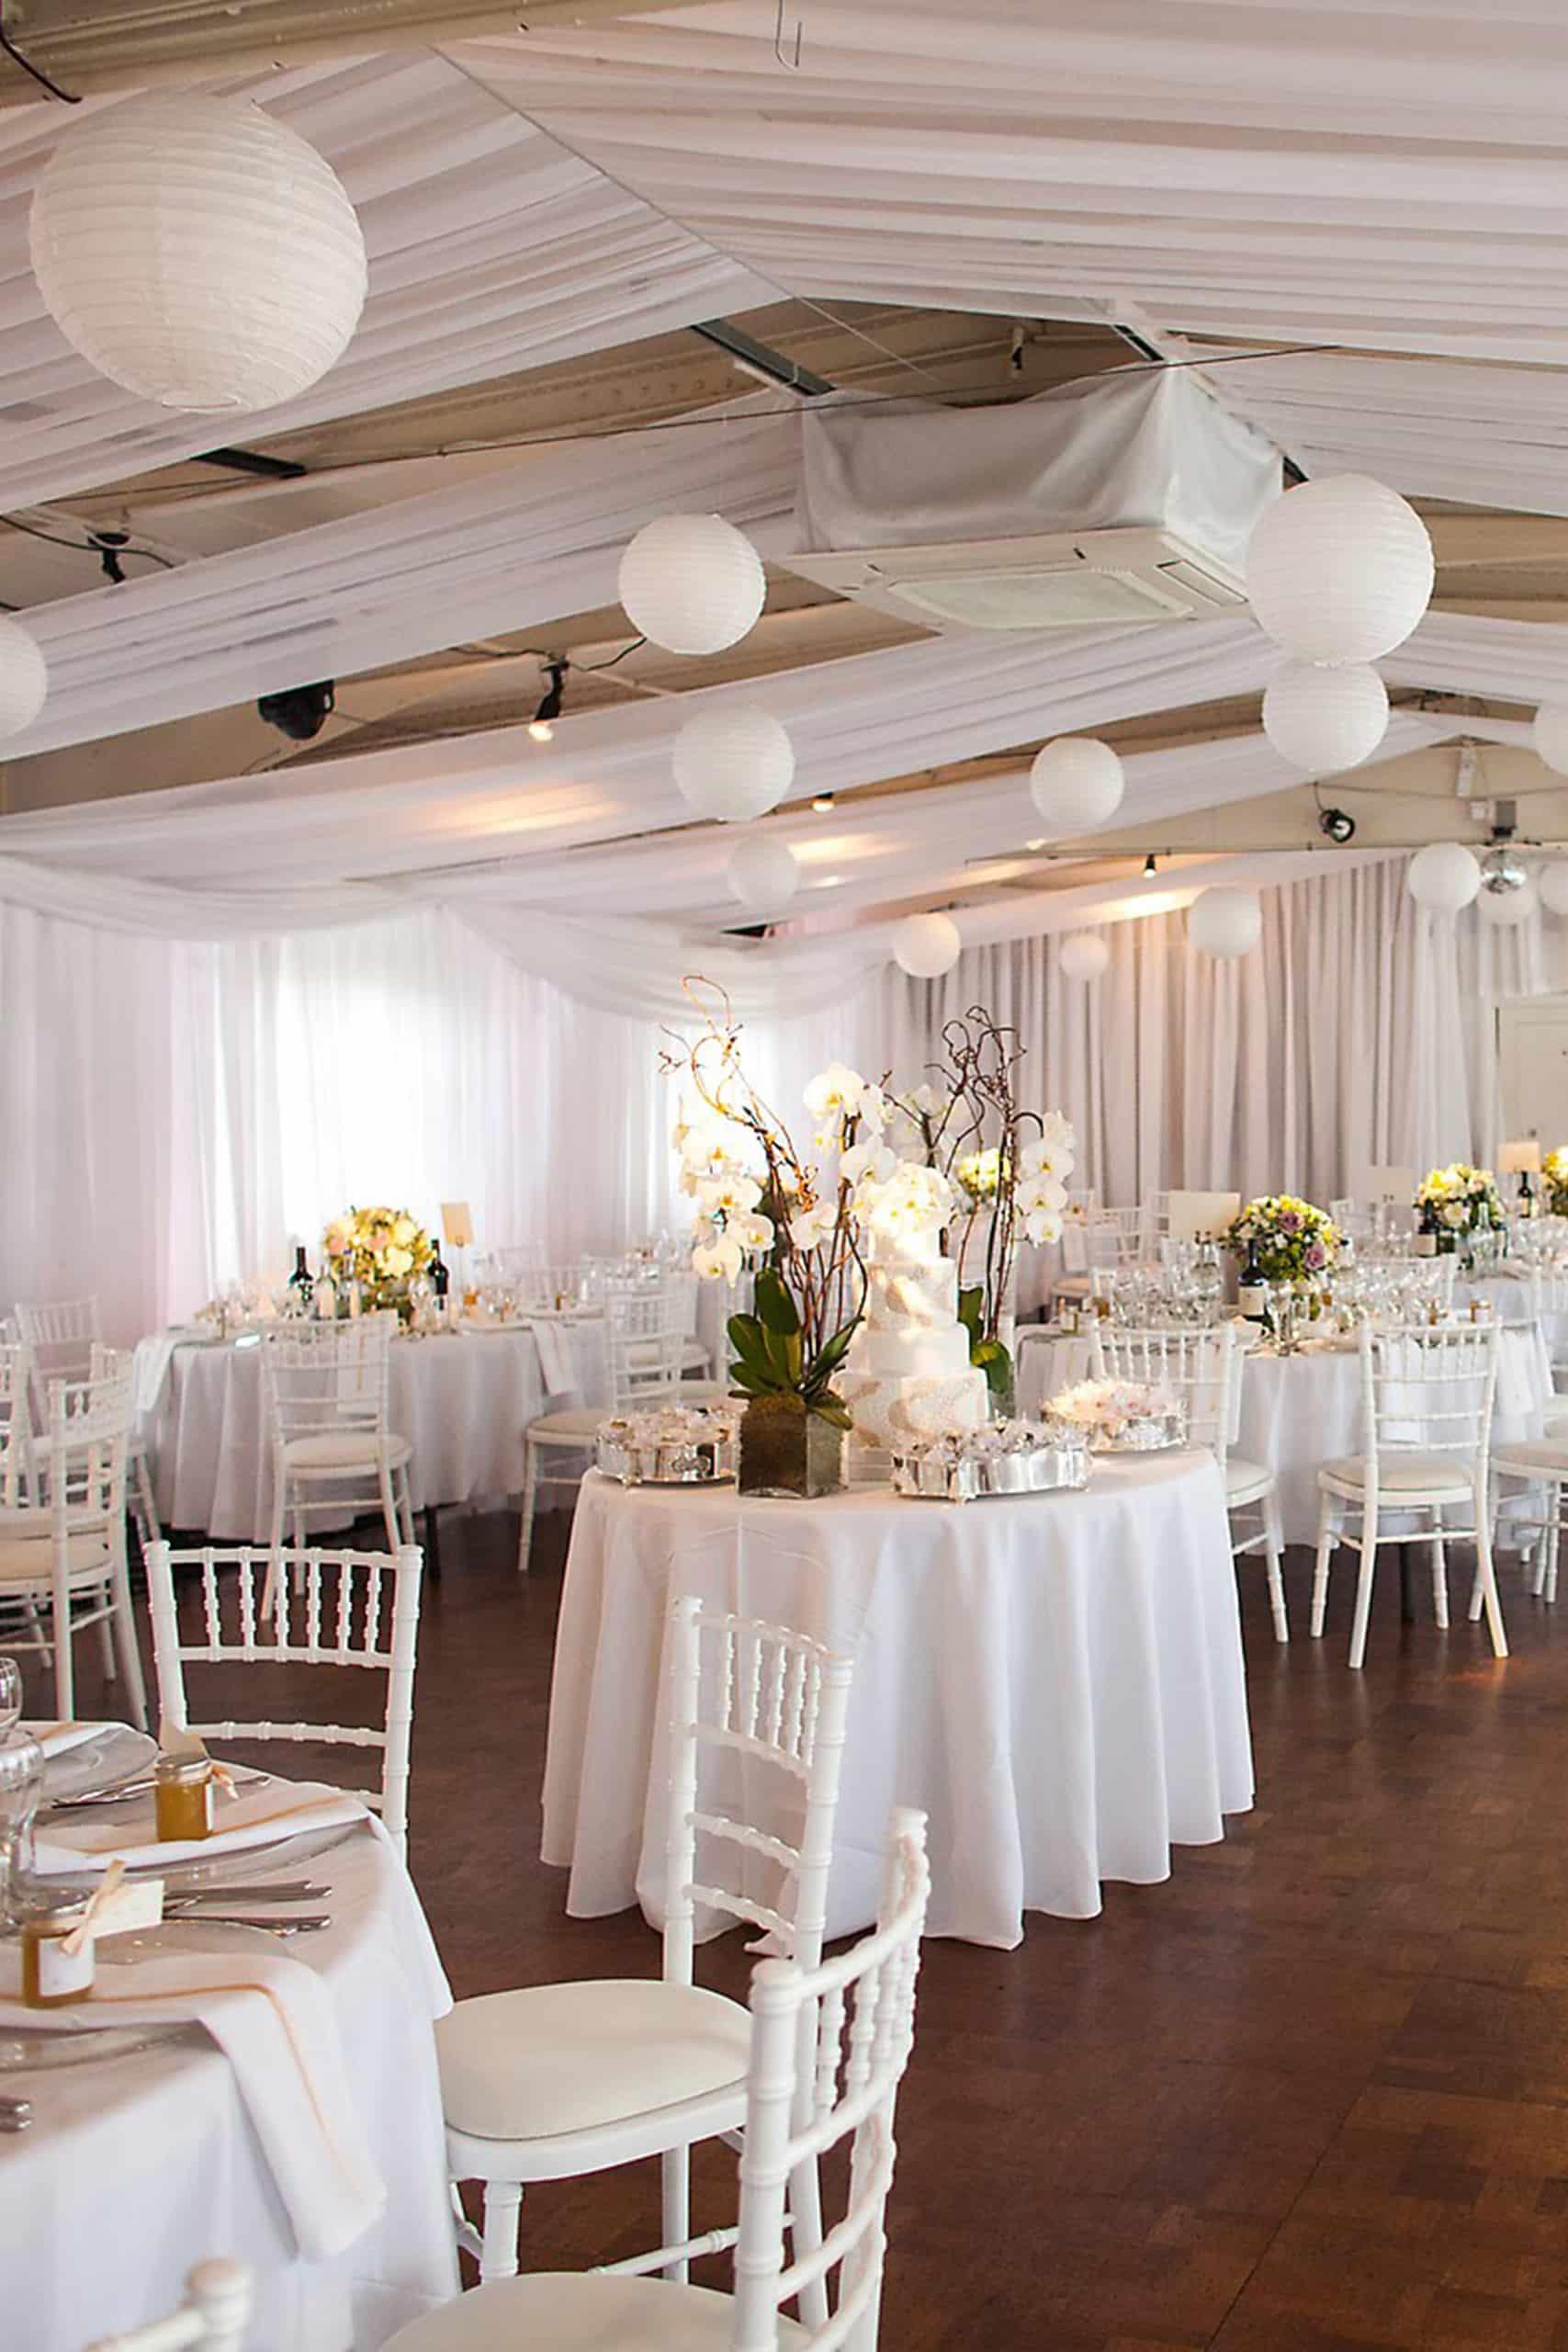 More Weddings white wall drapes